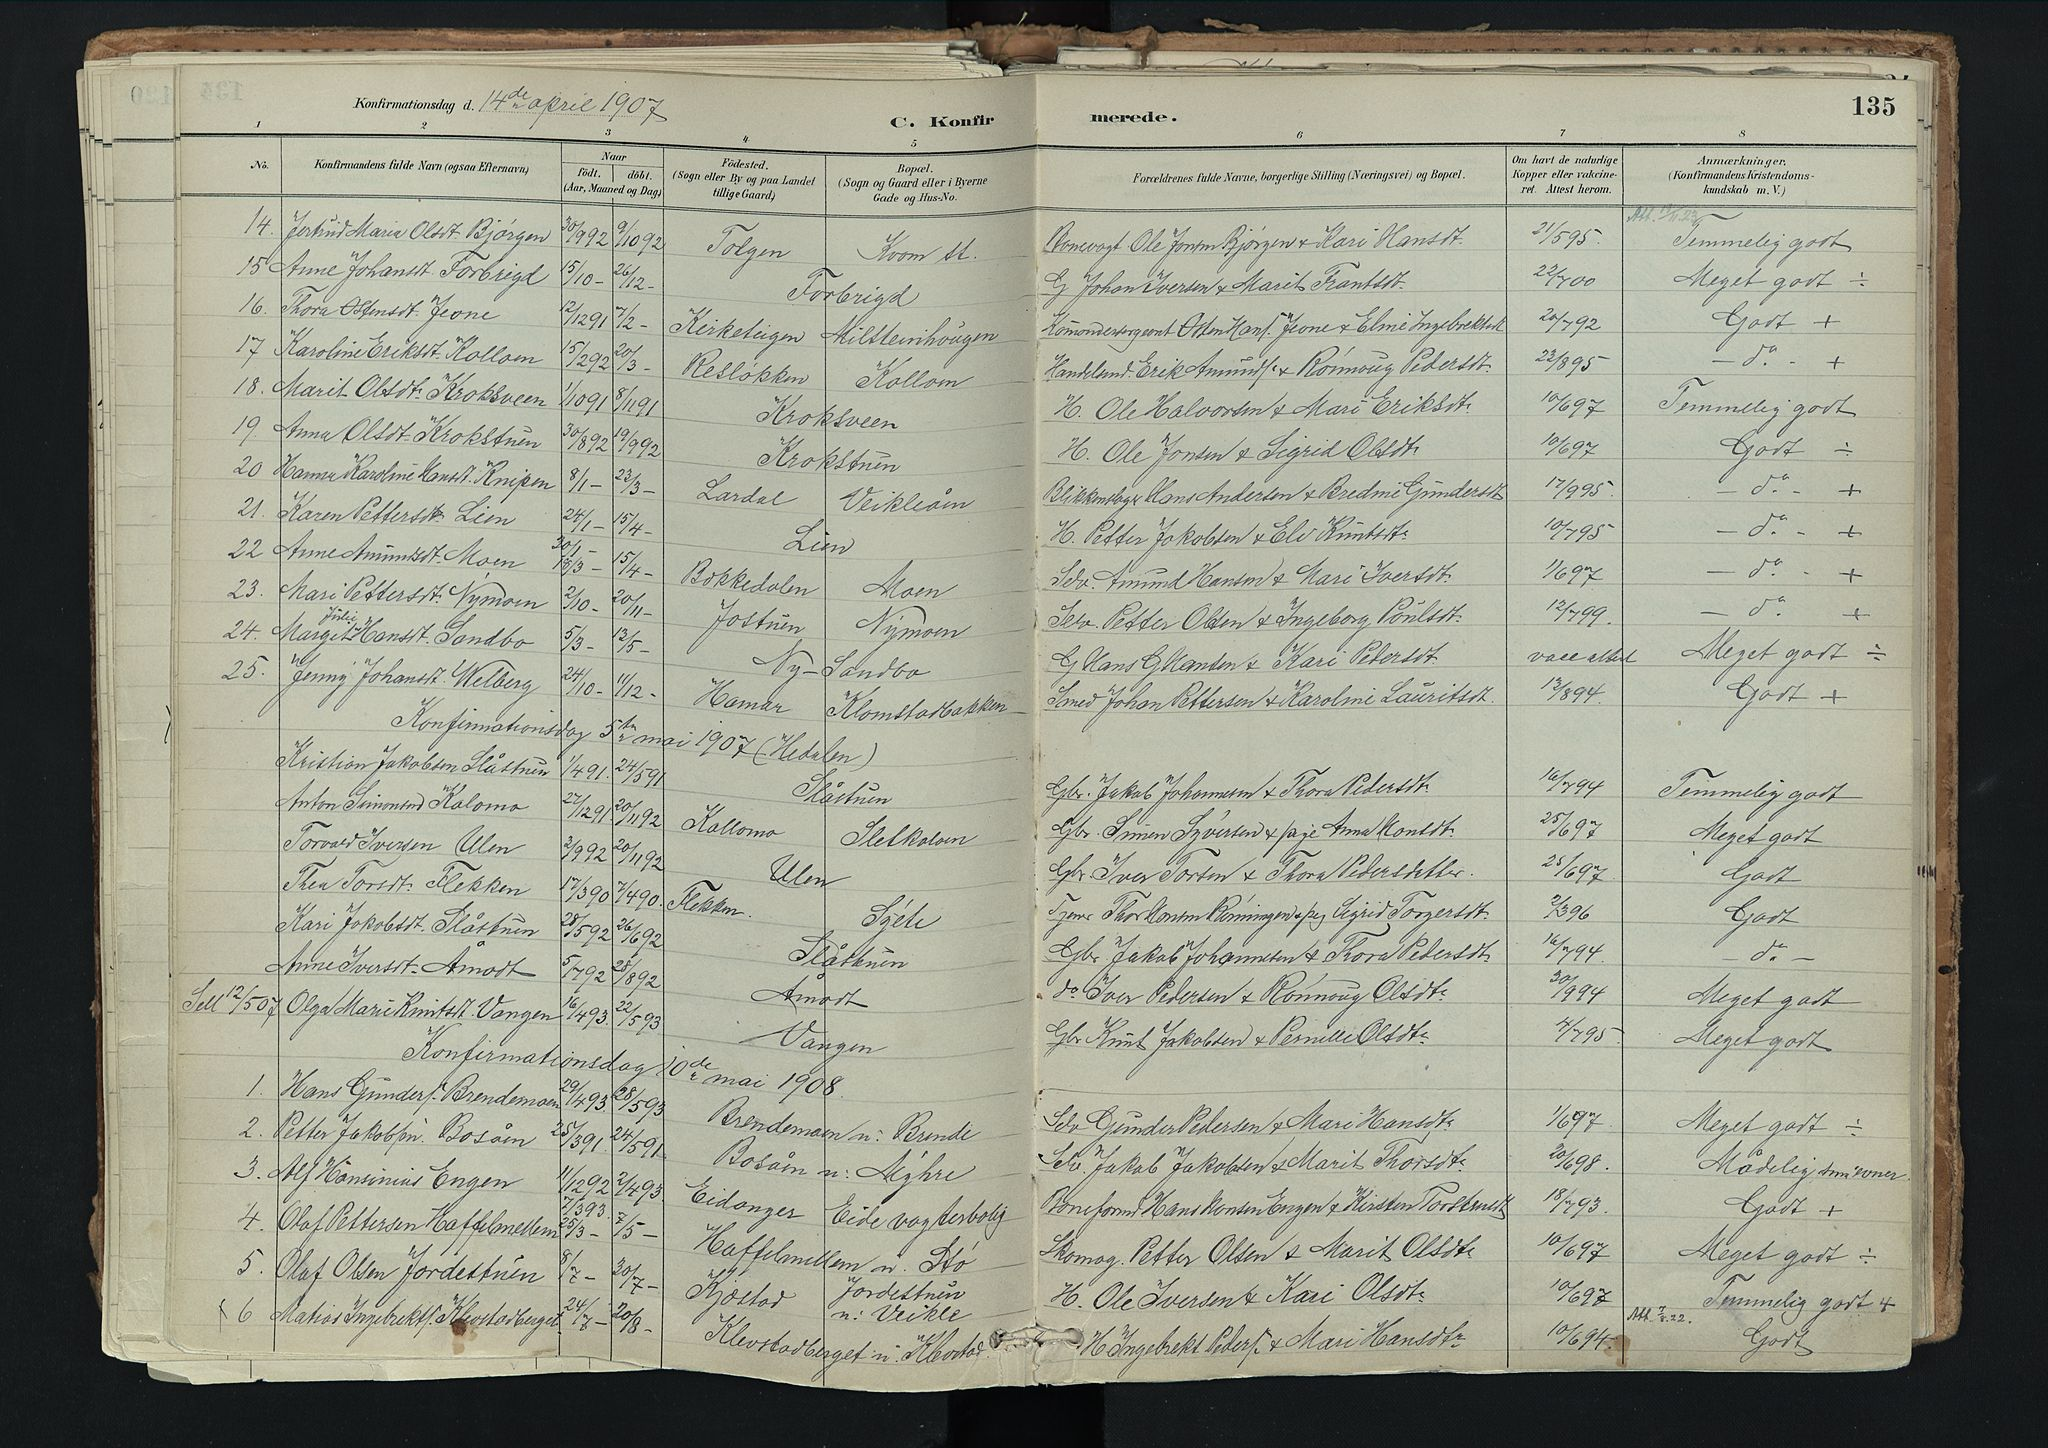 SAH, Nord-Fron prestekontor, Ministerialbok nr. 3, 1884-1914, s. 135